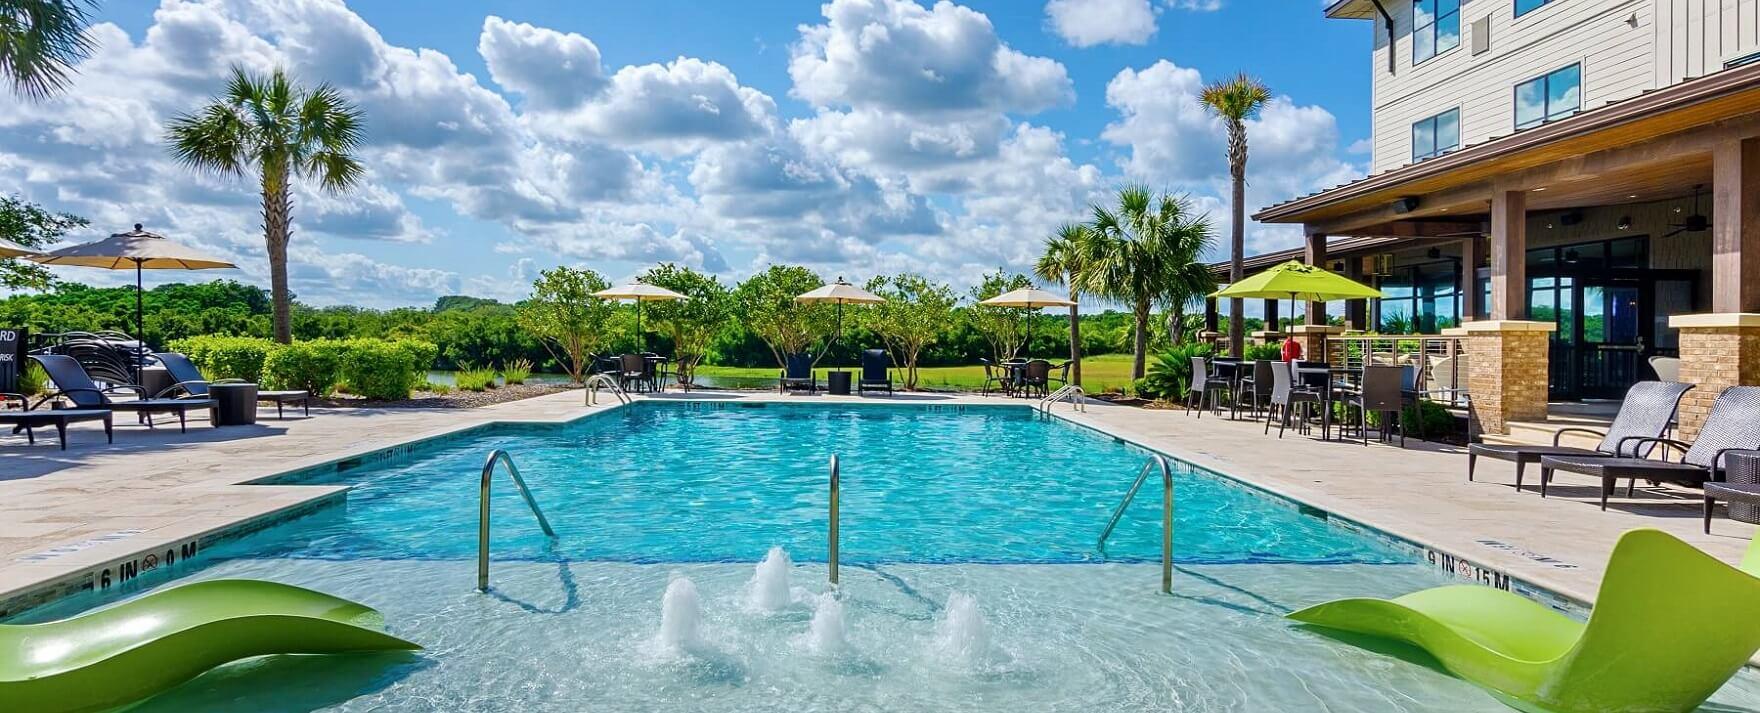 Andell Inn Pool